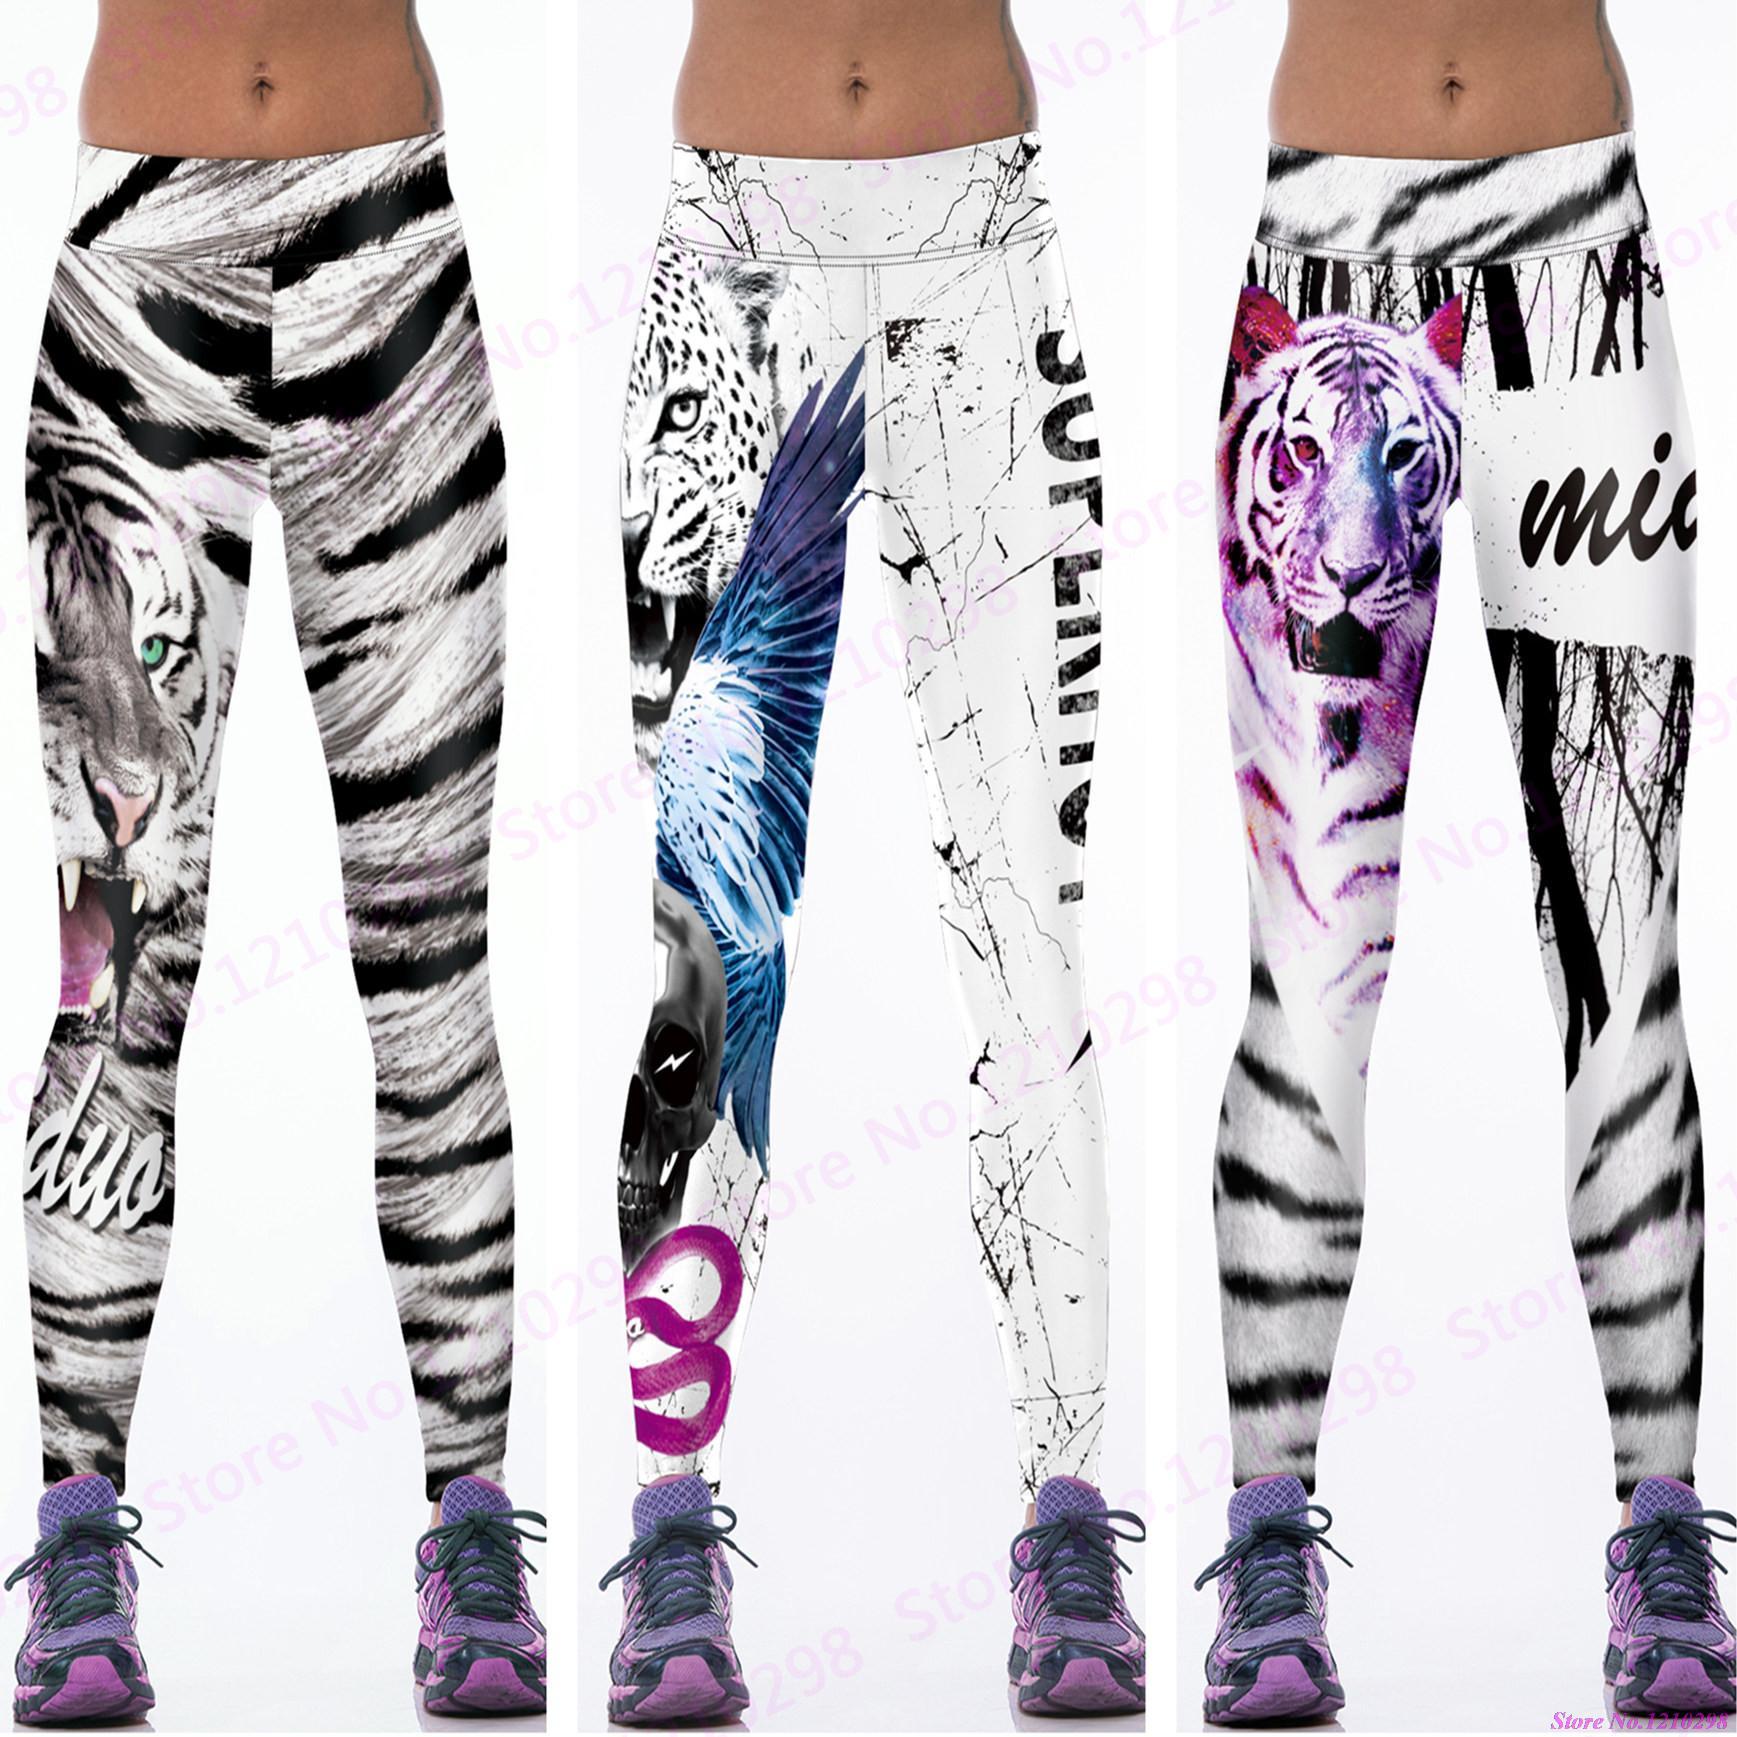 dd0d166508 Newest Women Slimming Training Fitness Sports Dance Trousers Jogging Wild Tiger  Yoga Pants Tight White Black Leopard Leggings